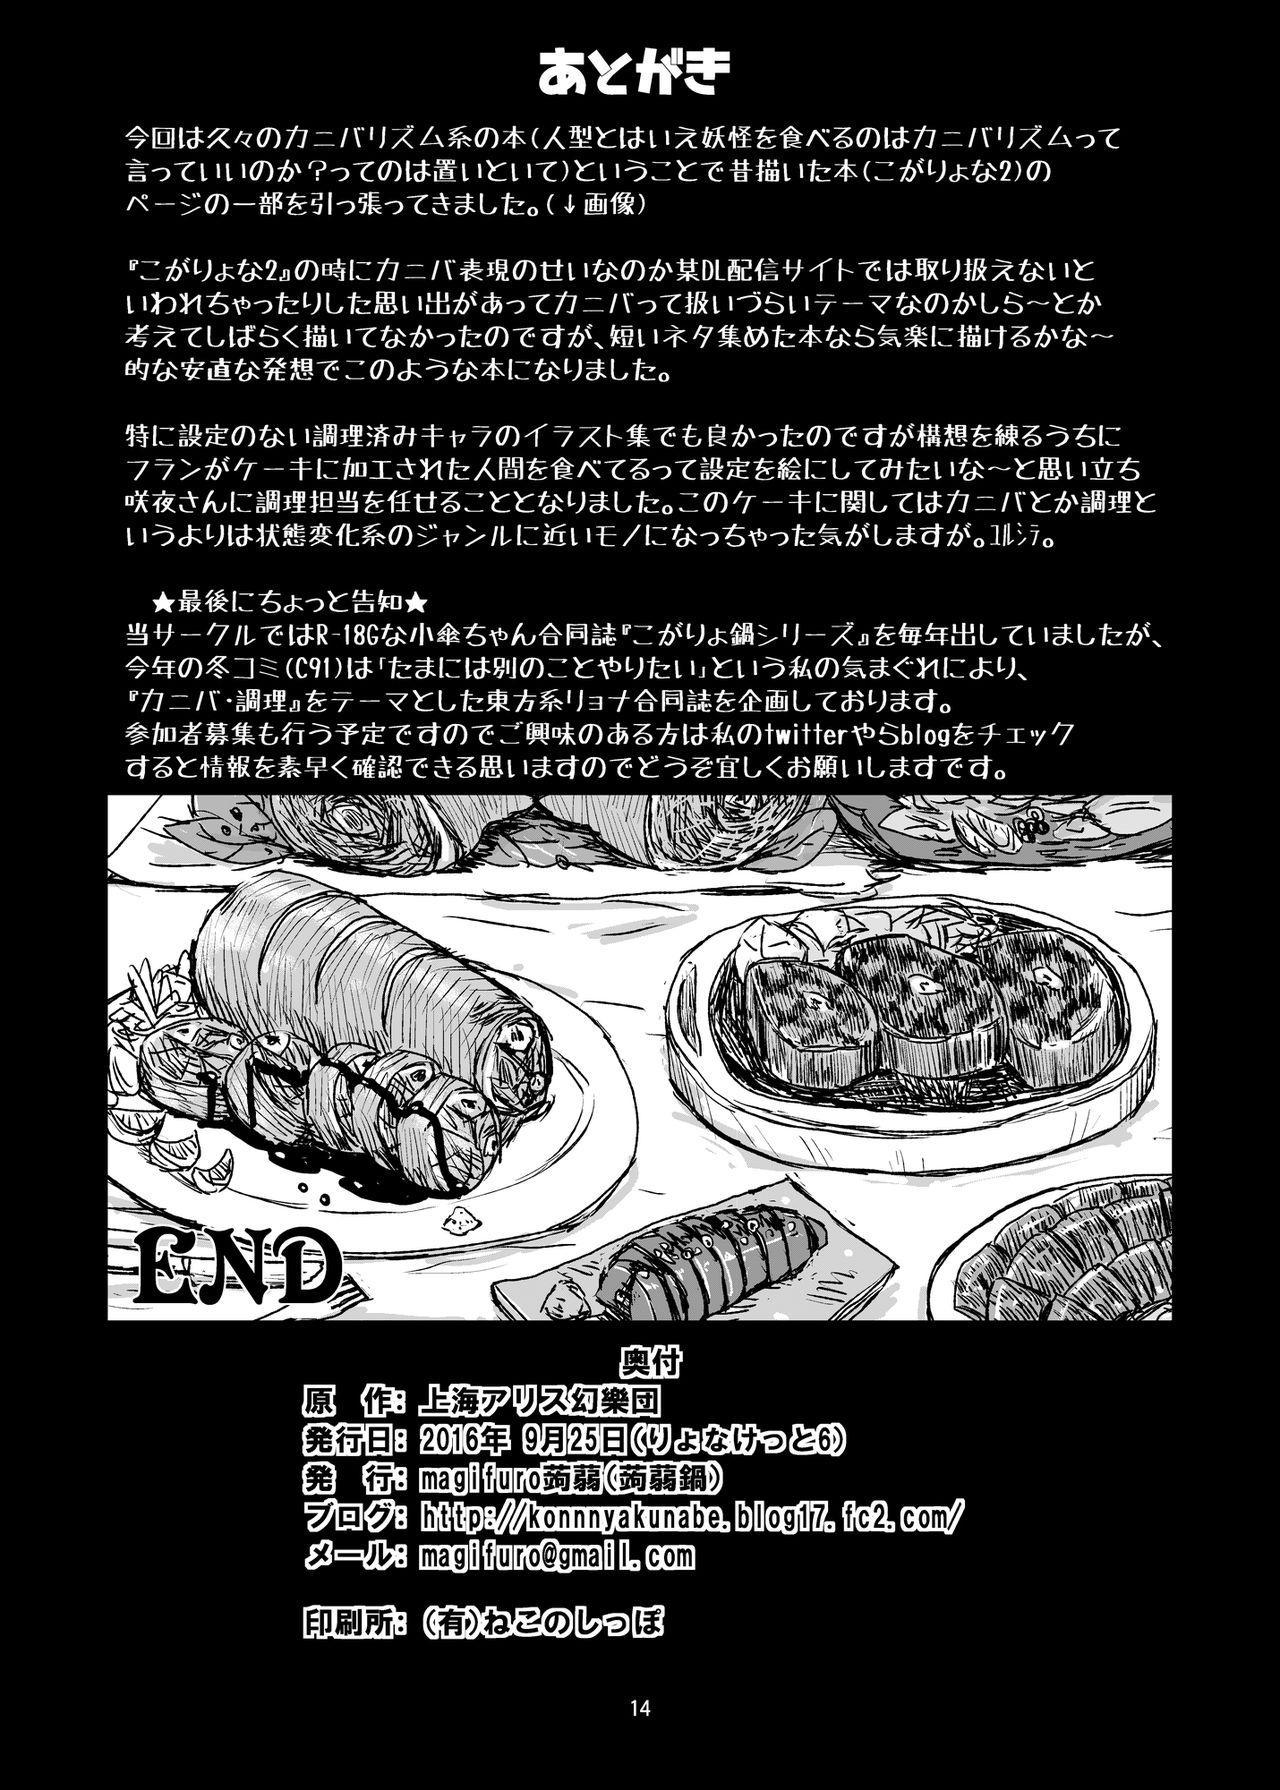 R-18G na Gensoukyou Oryouri Nisshi | Gensokyo Culinary Log 12